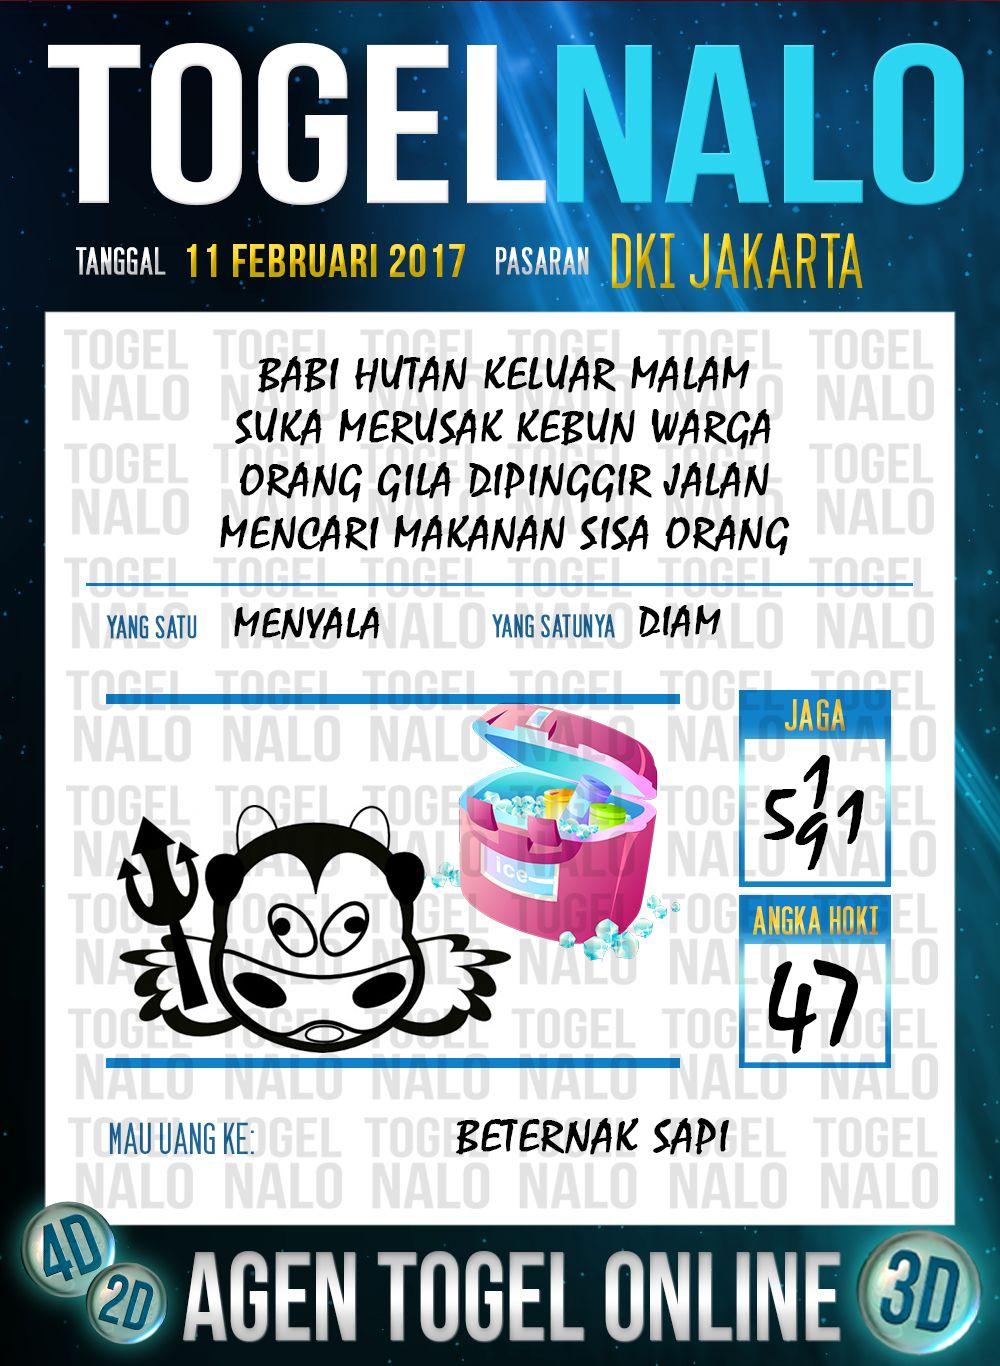 Acak Kodal 4d Togel Wap Online Live Draw 4d Togelnalo Dki Jakarta 11 Februari 2017 Januari 26 Januari 27 Januari